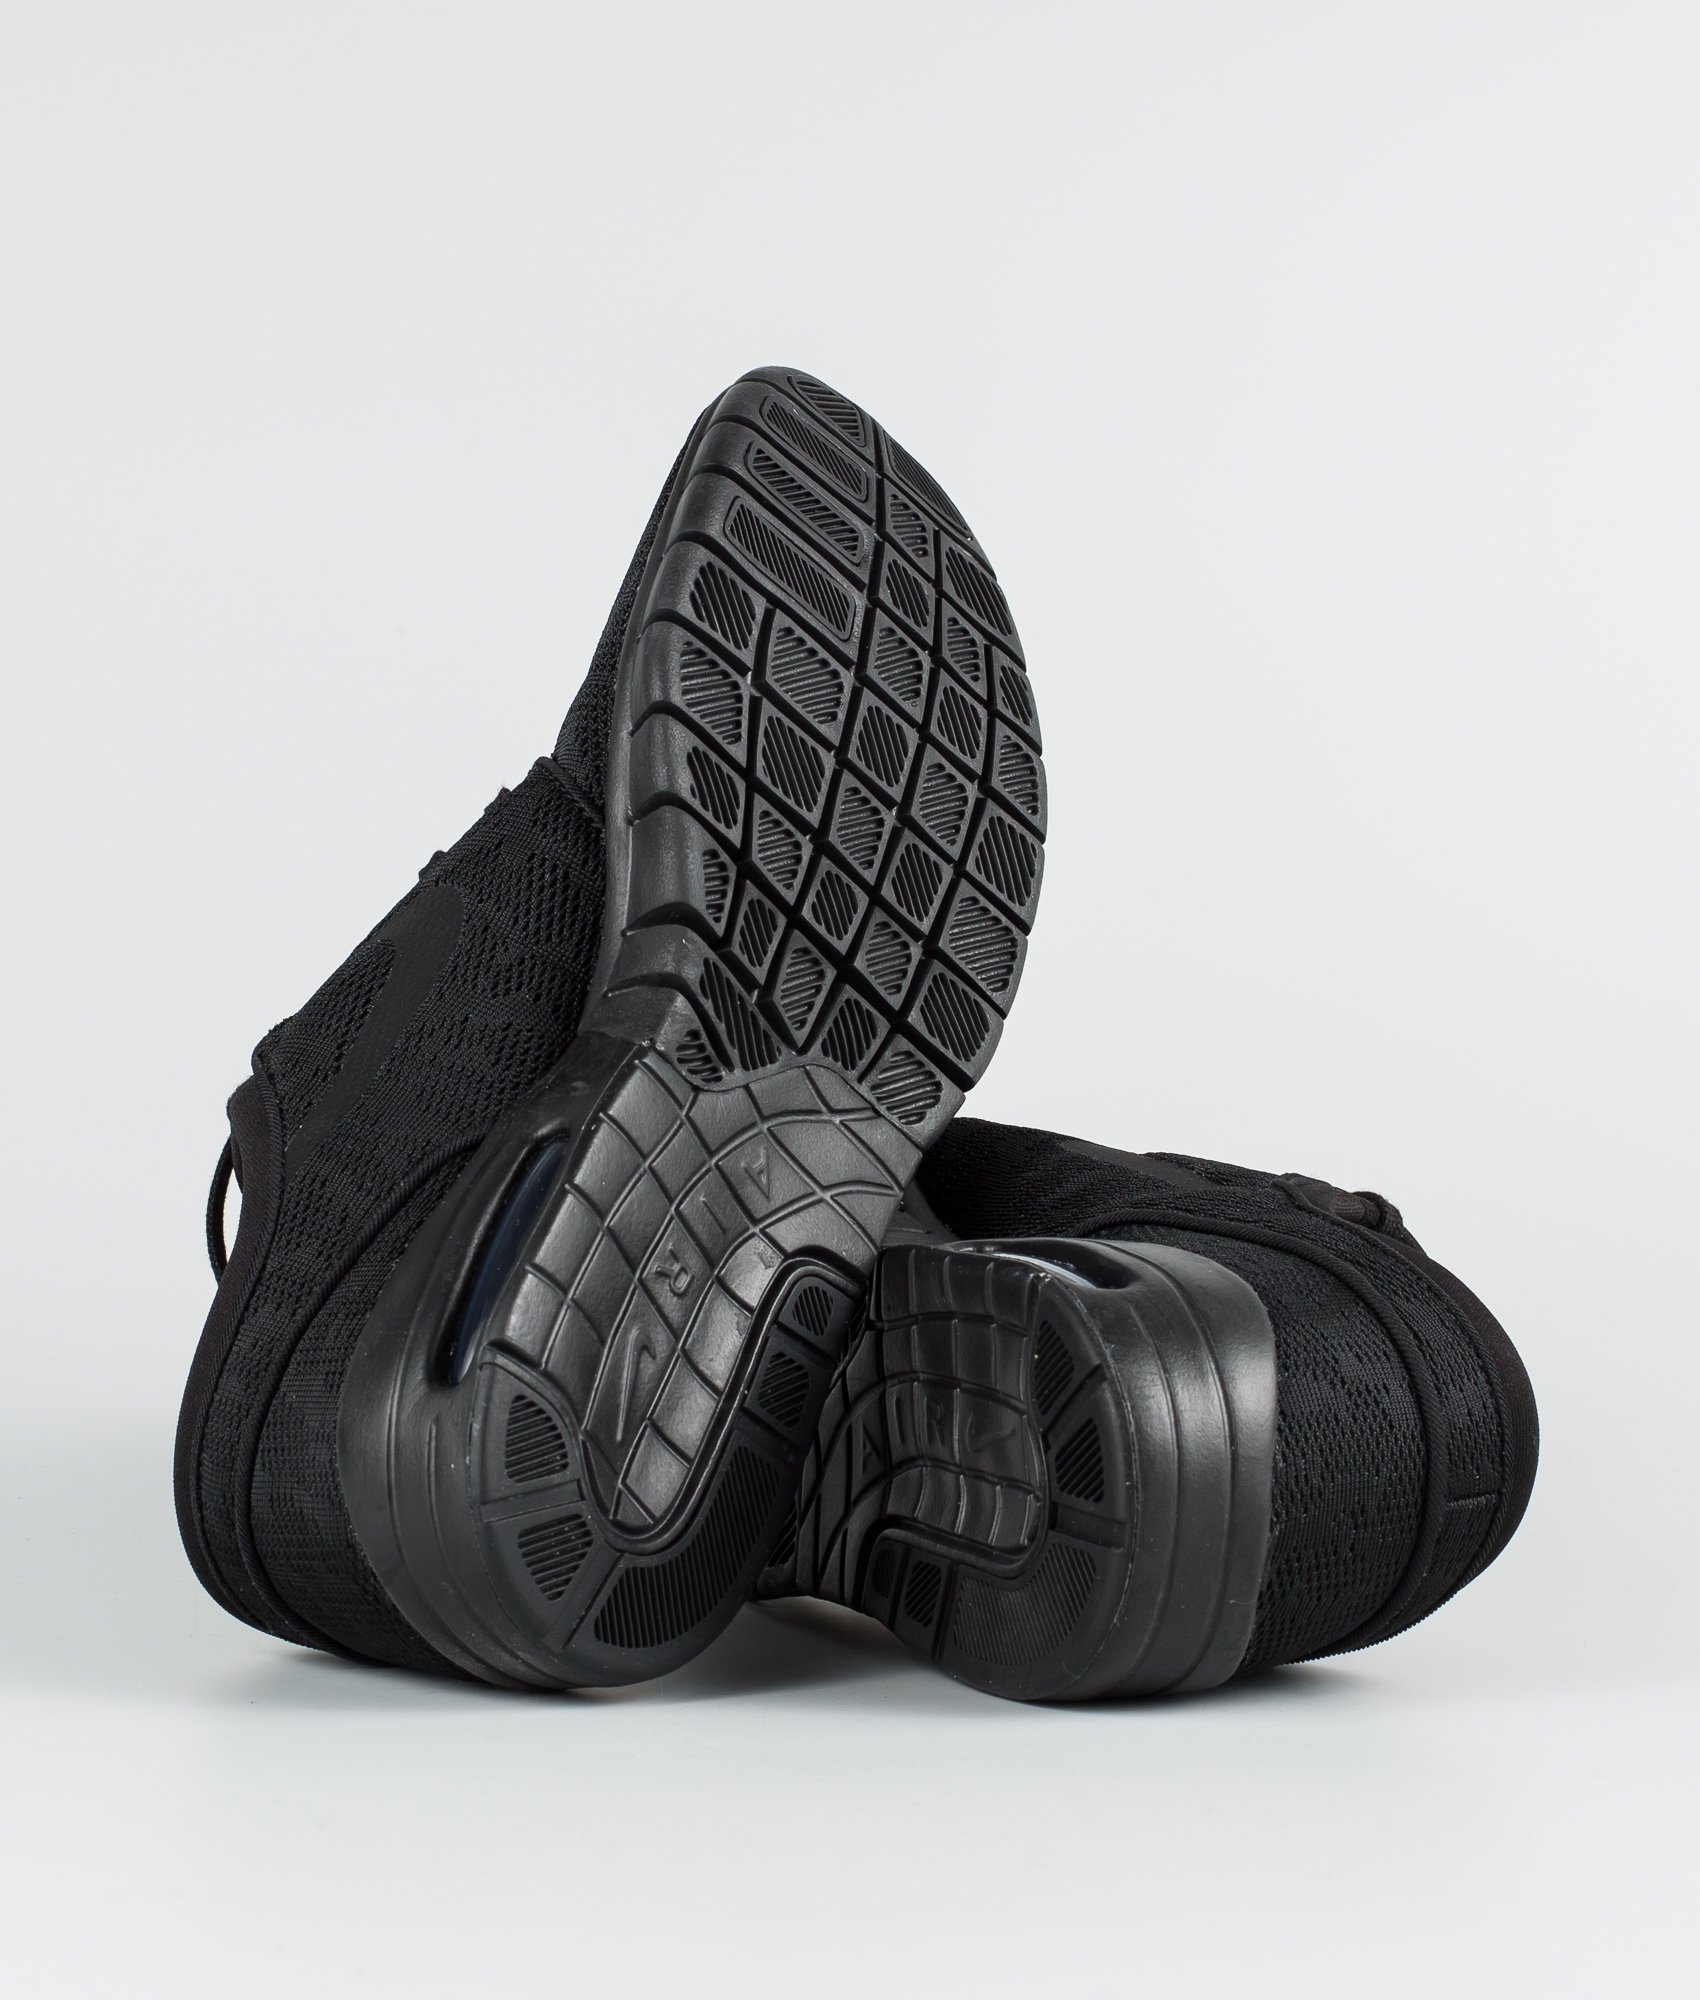 Nike Max nl Ridestore Janoski Schoenen Blackblack Anthracite Stefan shxrBtCQd